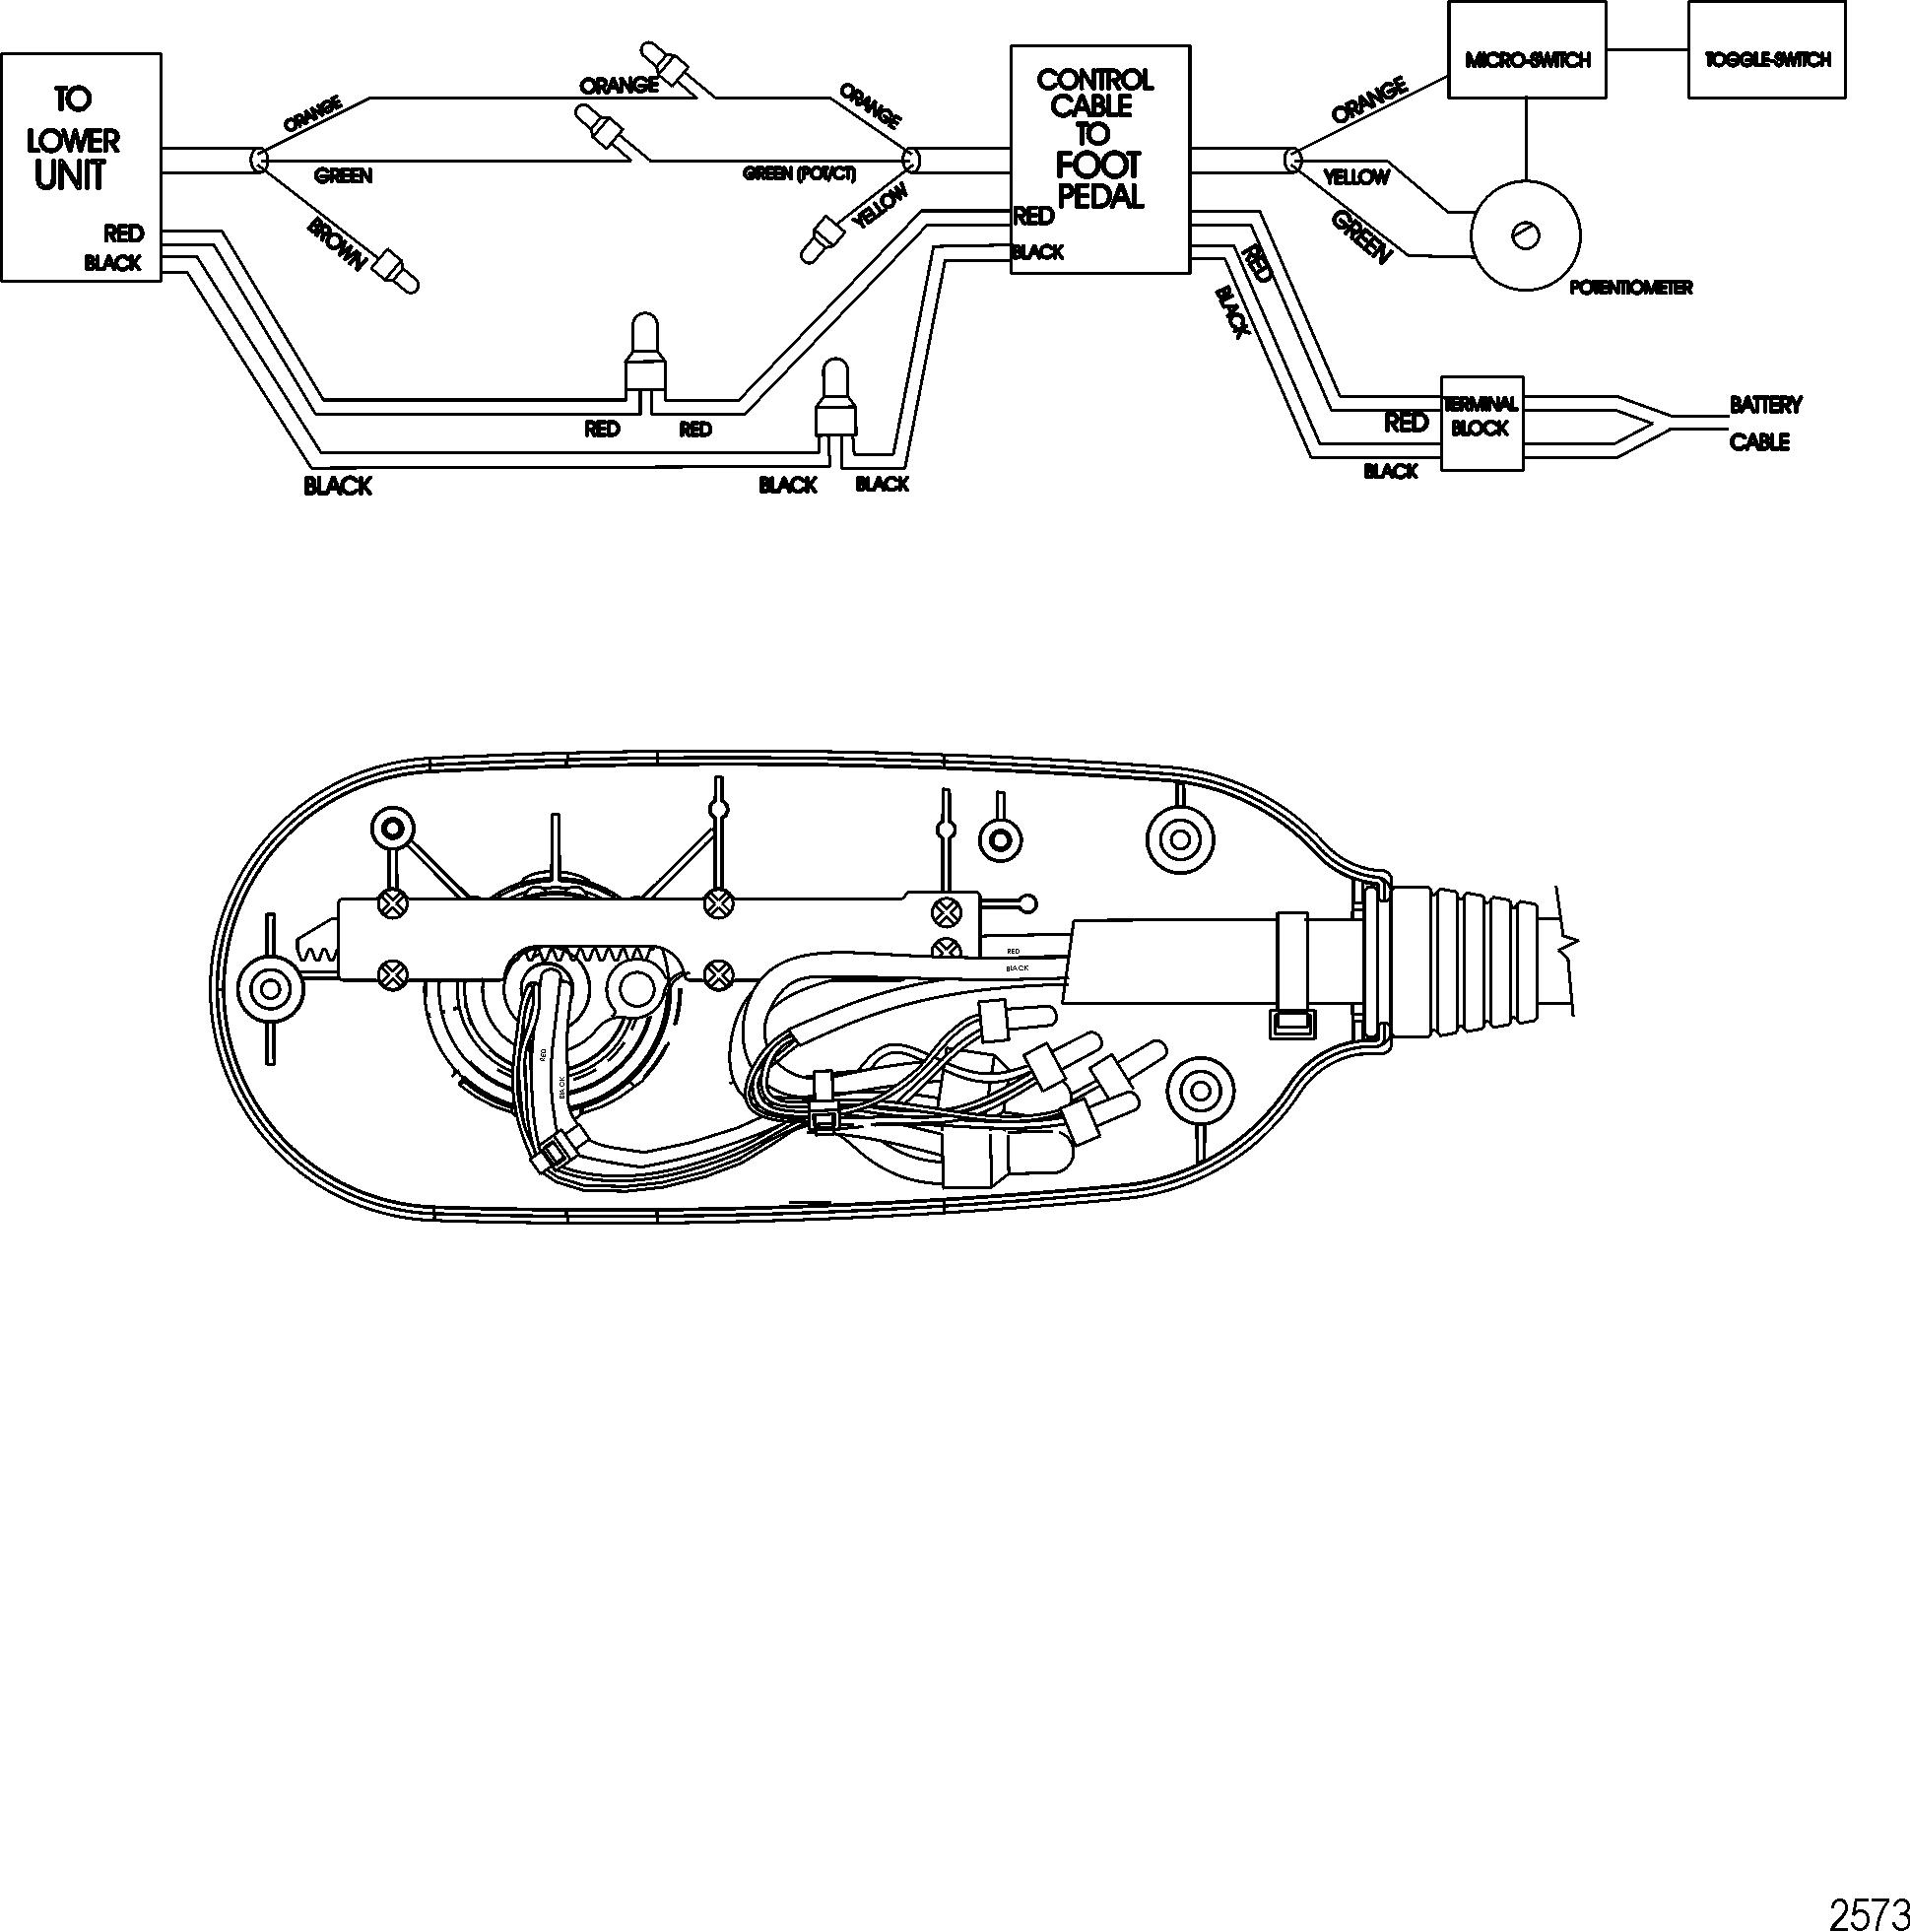 Motorguide Parts Diagram